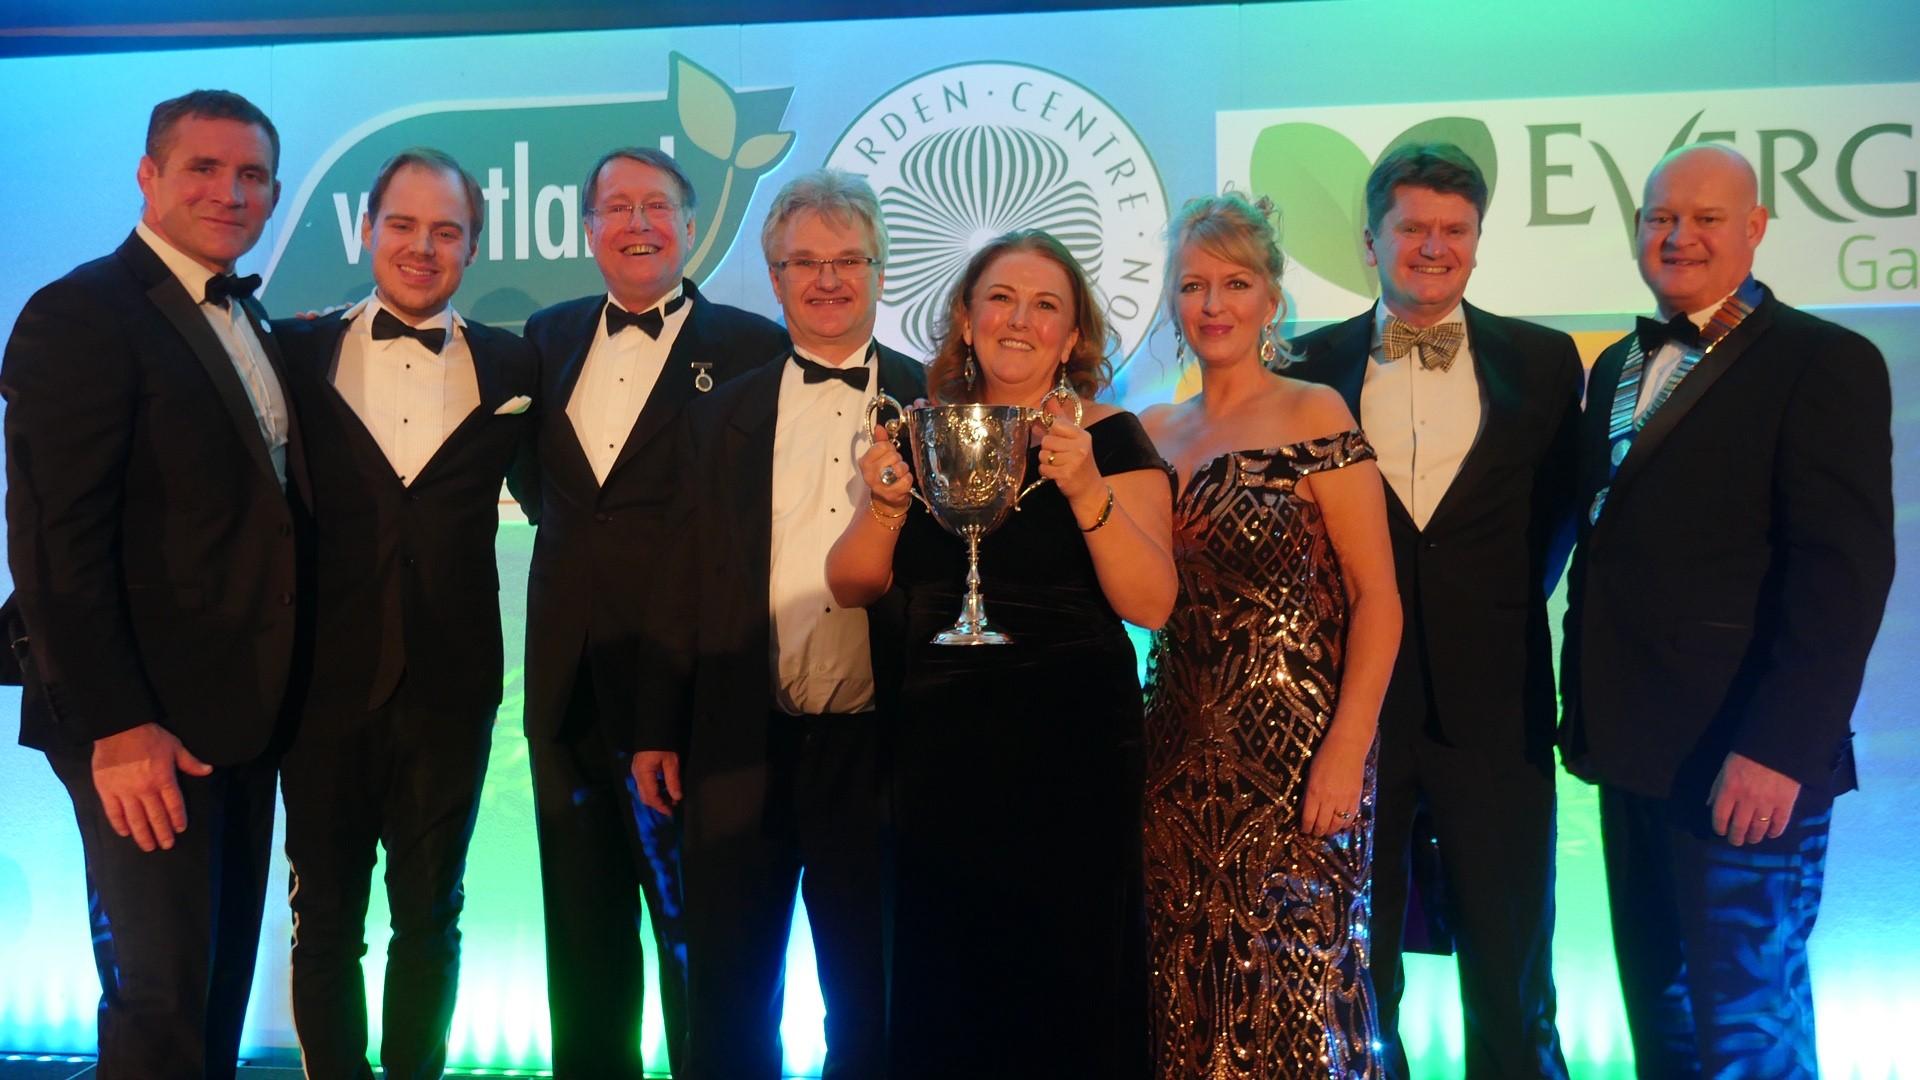 Haskins Garden Centres scoops multiple awards at the Garden Centre Association Conference 2019